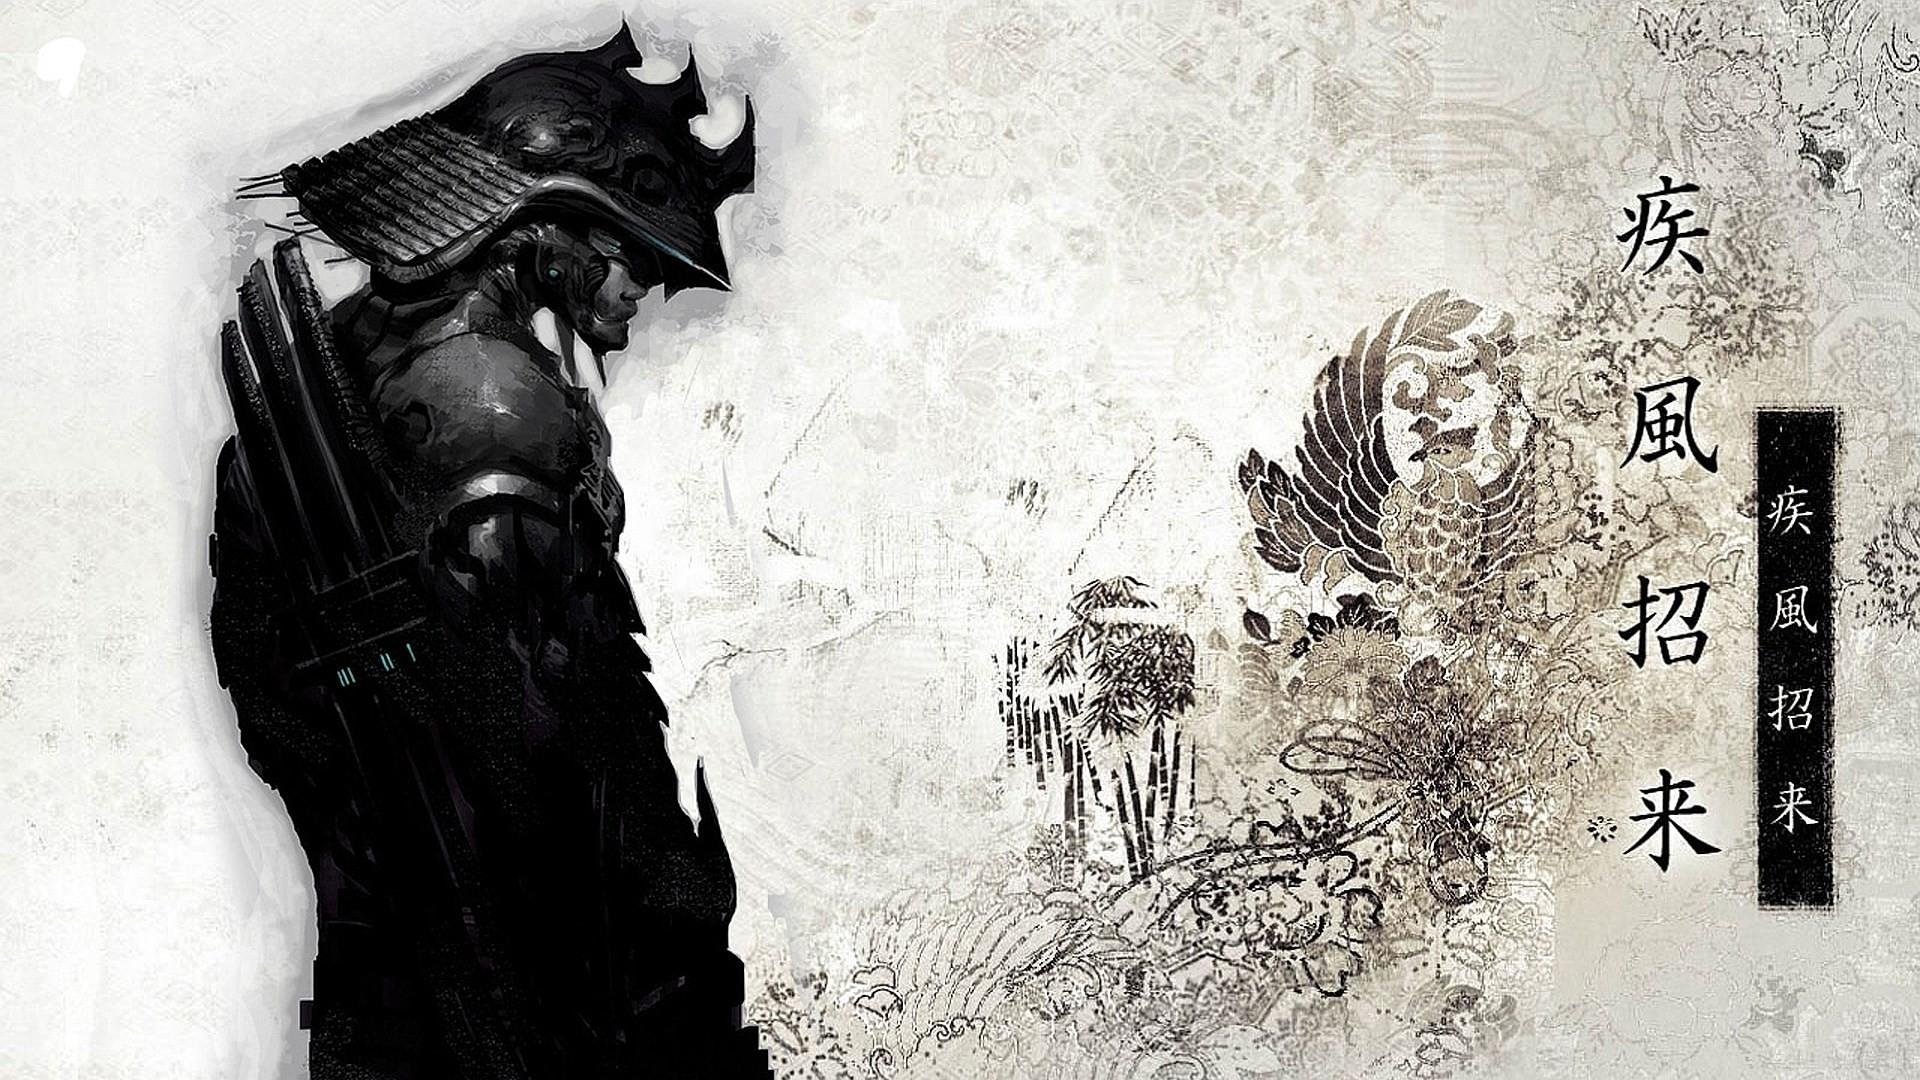 samurai image – Full HD Wallpapers, Photos, (586 kB)